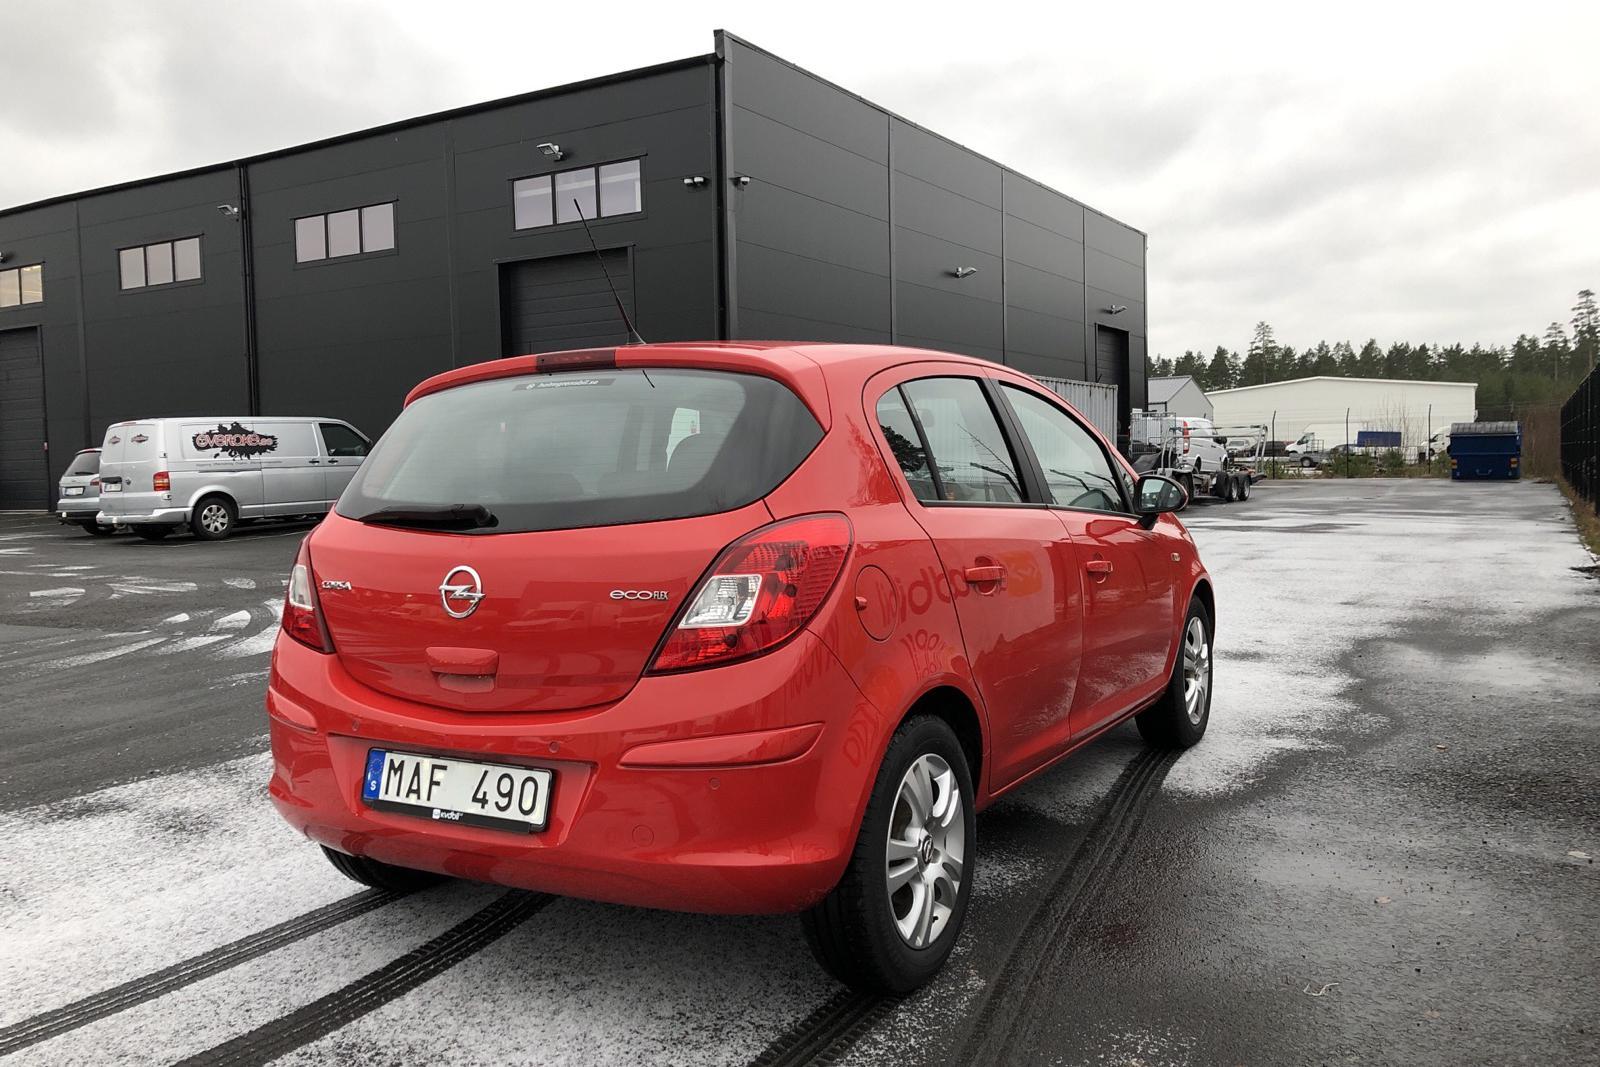 Opel Corsa 1.2 Twinport 5dr (85hk) - 88 430 km - Manual - red - 2012